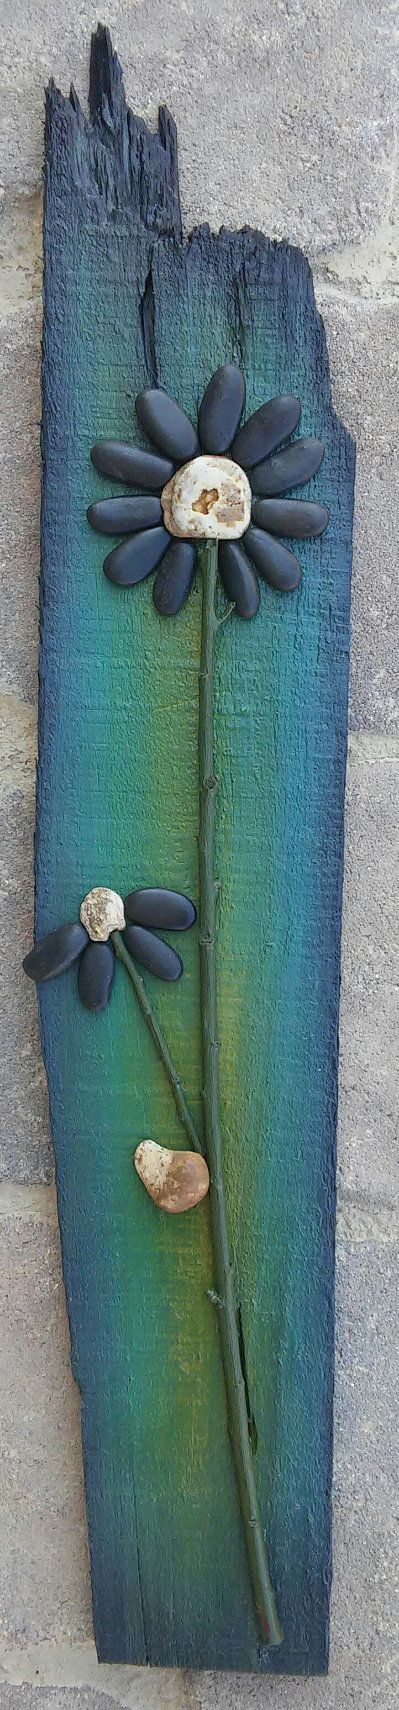 Ciottolo Art arte rupestre ghiaia arte fiori Rock di CrawfordBunch